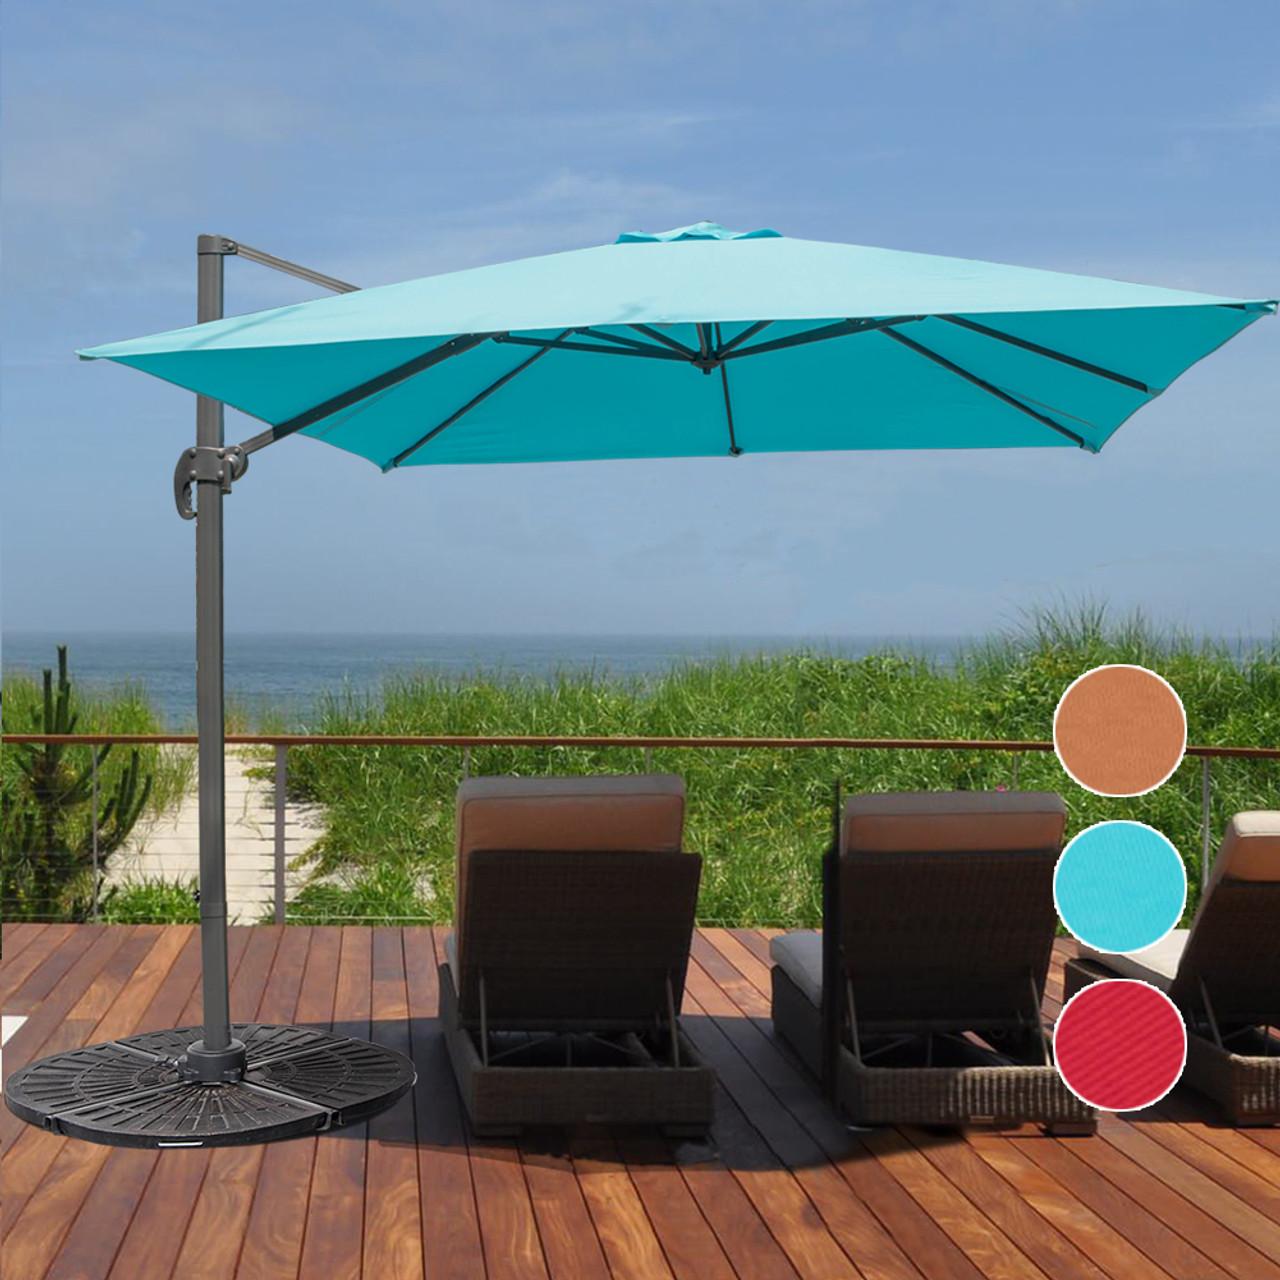 10 feet aluminum offset patio umbrella with crank(apple green) Backyard Umbrella